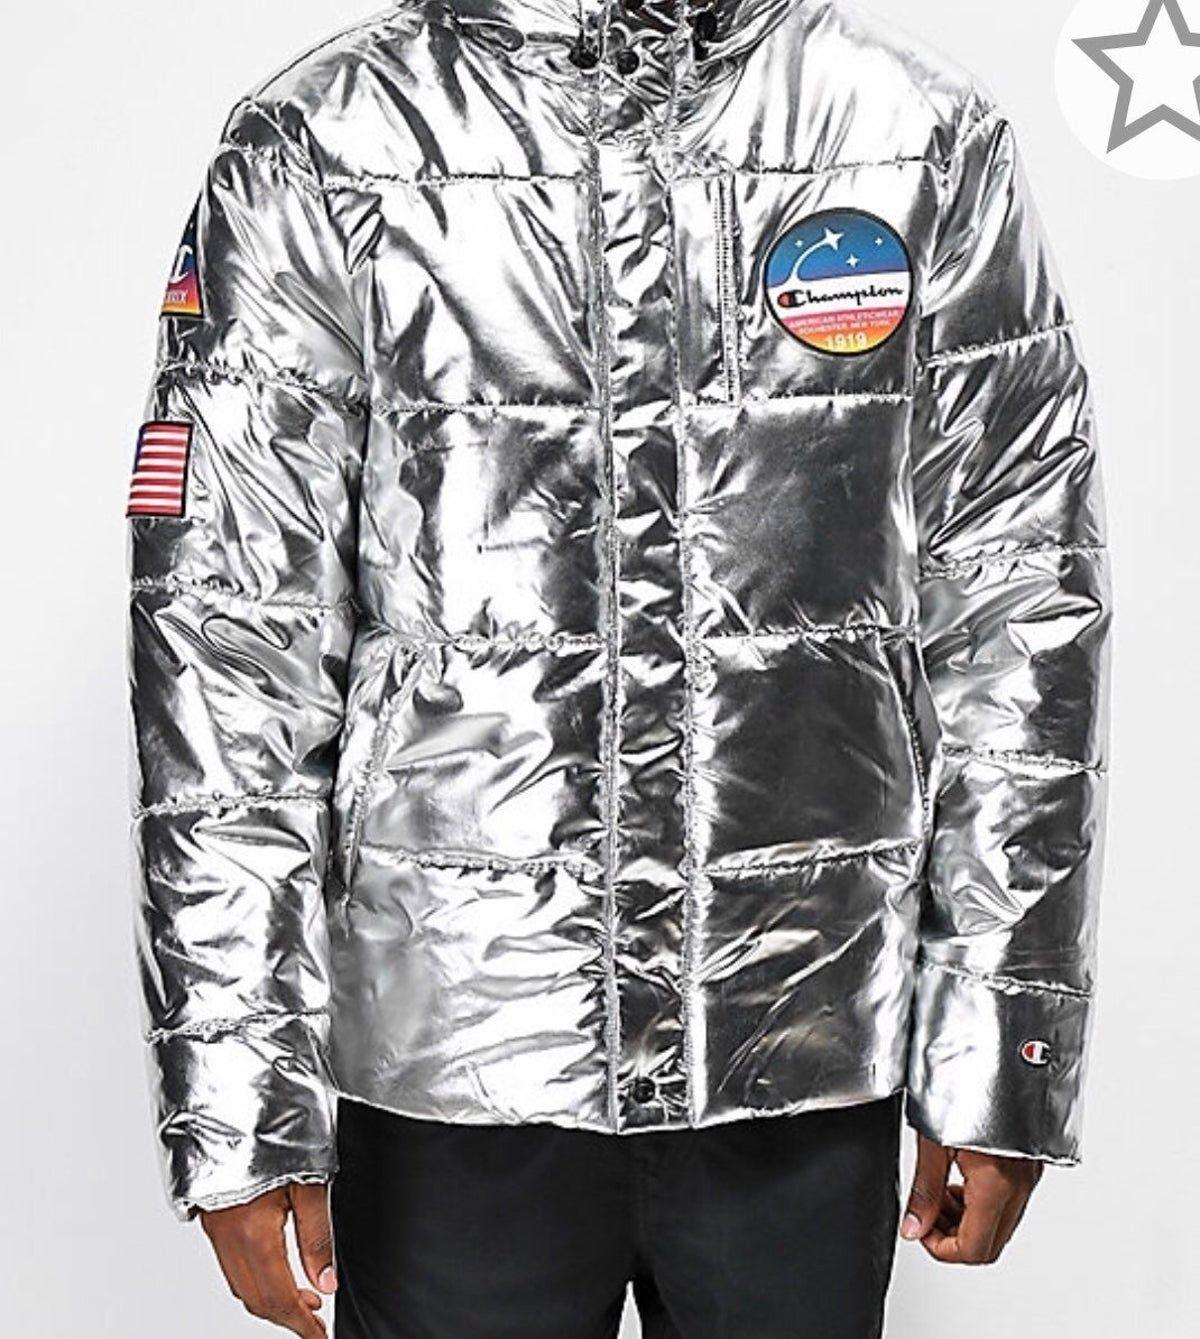 Champion Metallic Silver Puffer Jacket Silver Puffer Jacket Nasa Jacket Jackets [ 1339 x 1200 Pixel ]